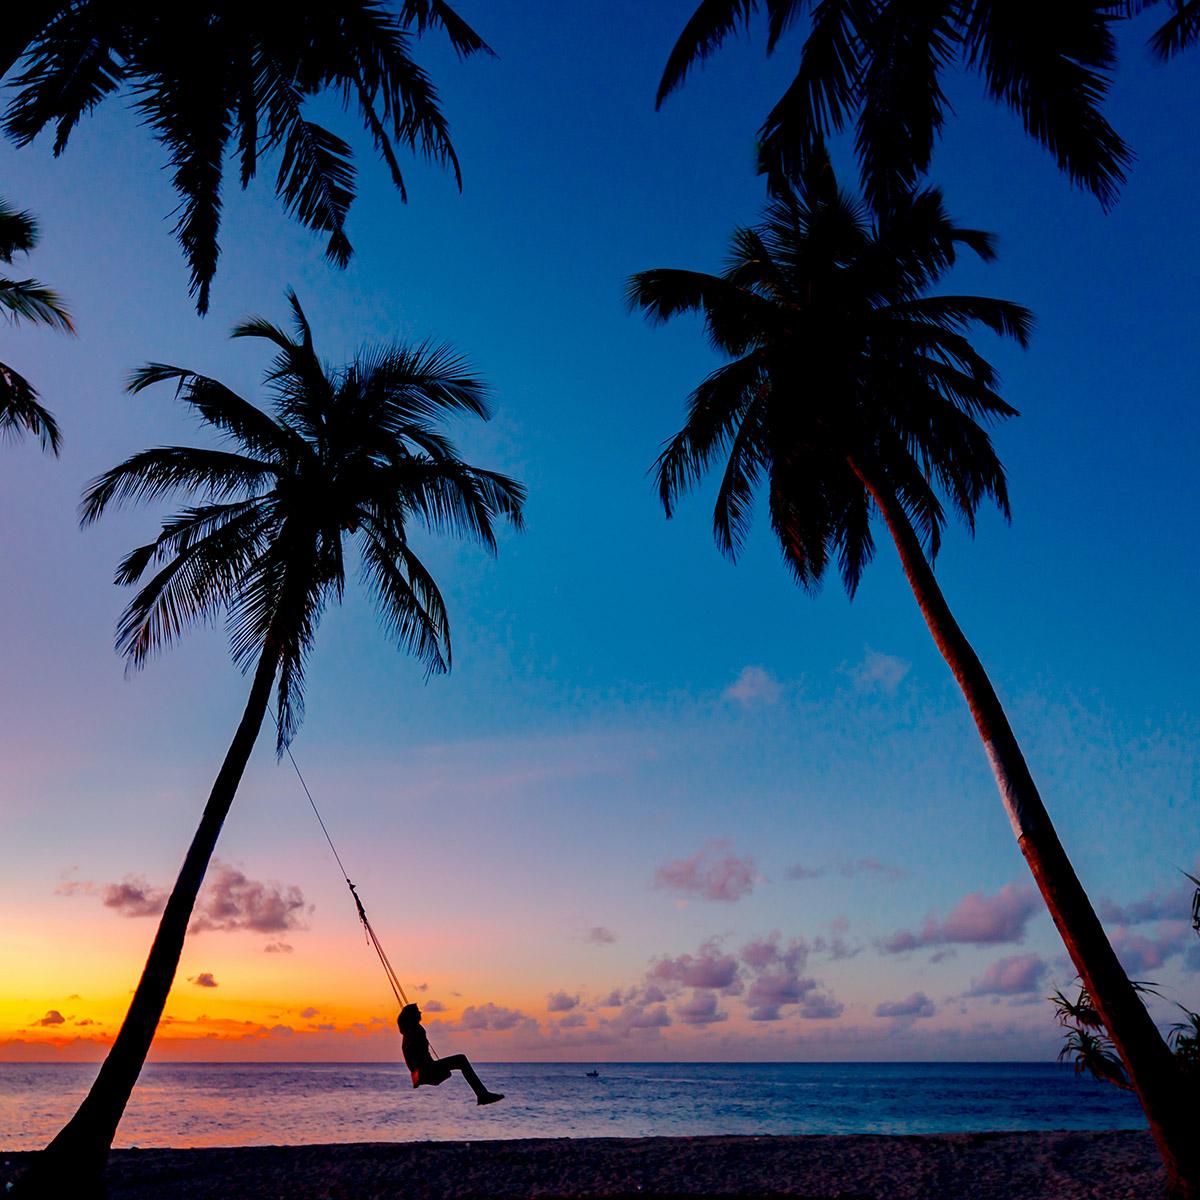 Bucket List Travel 2021 - The Maldives